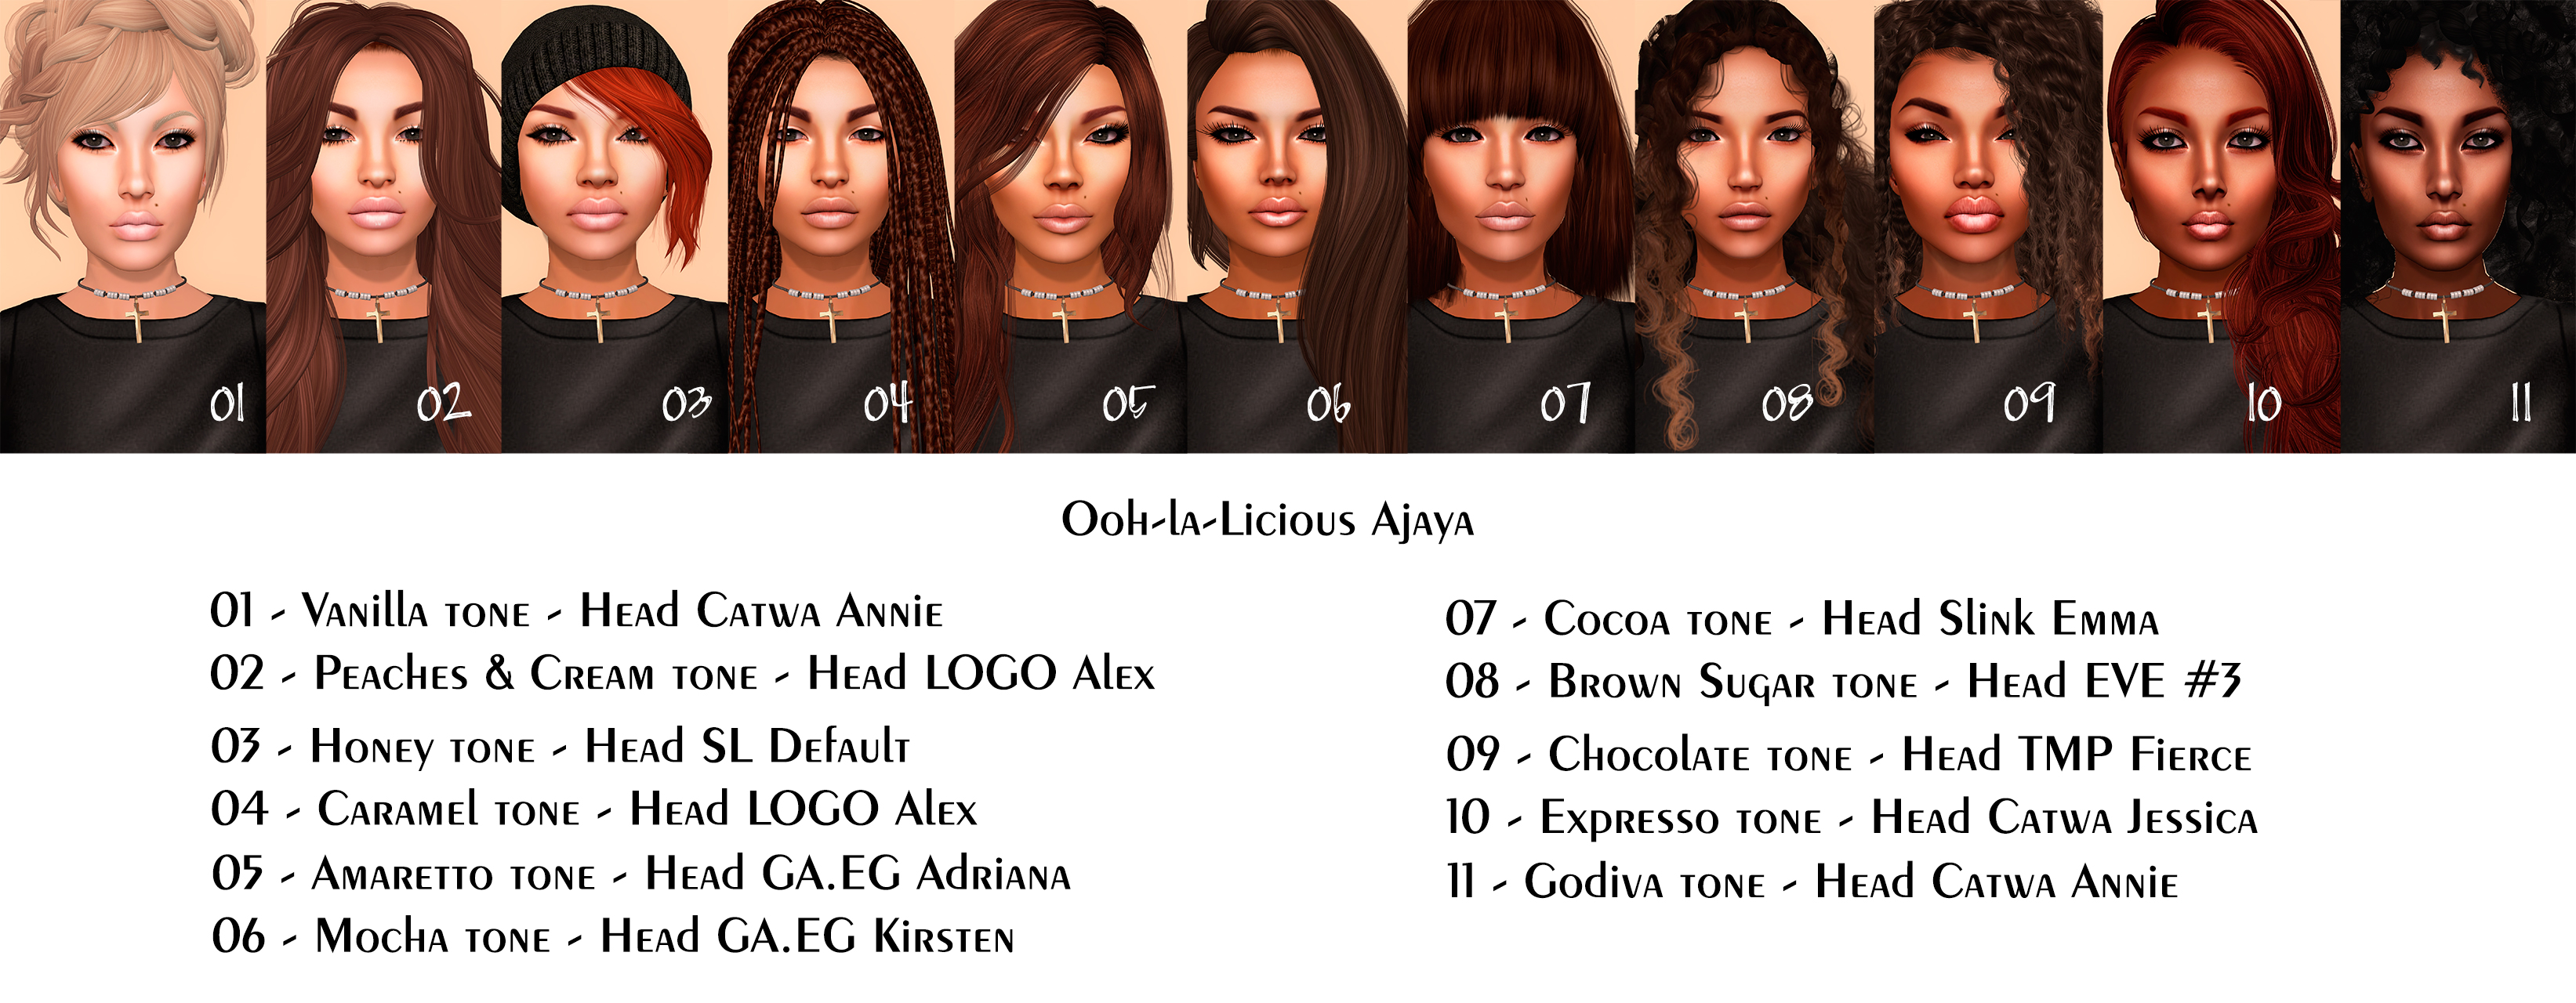 Ooh-la-Licious-Ajaya-Skin-Fair-2016